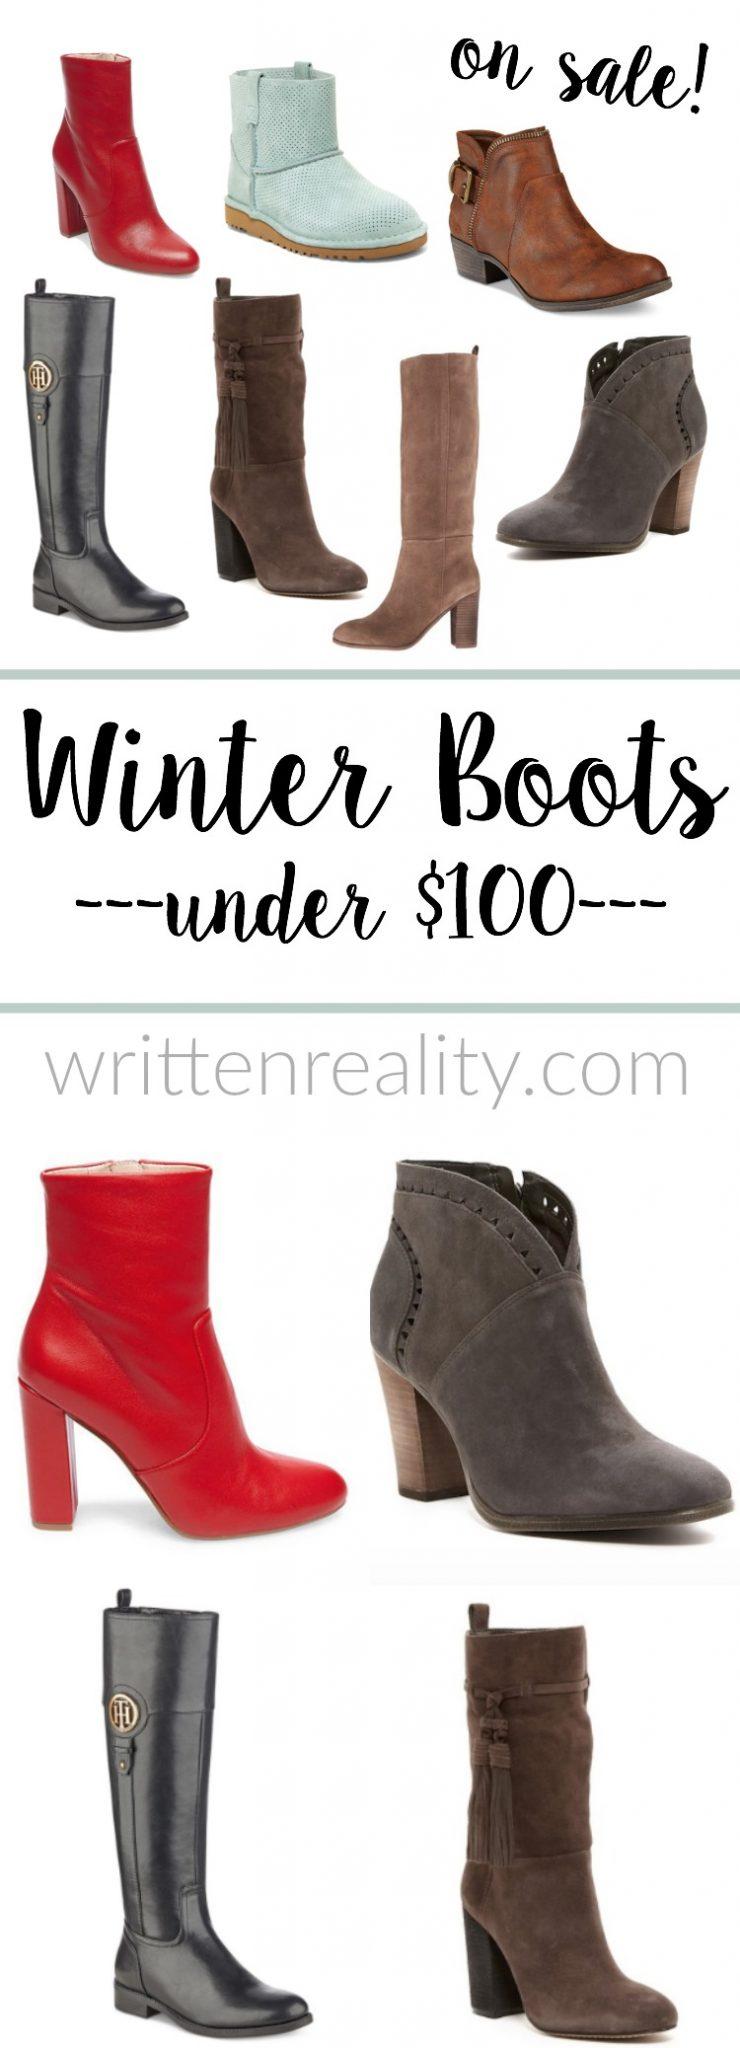 women boots under $100